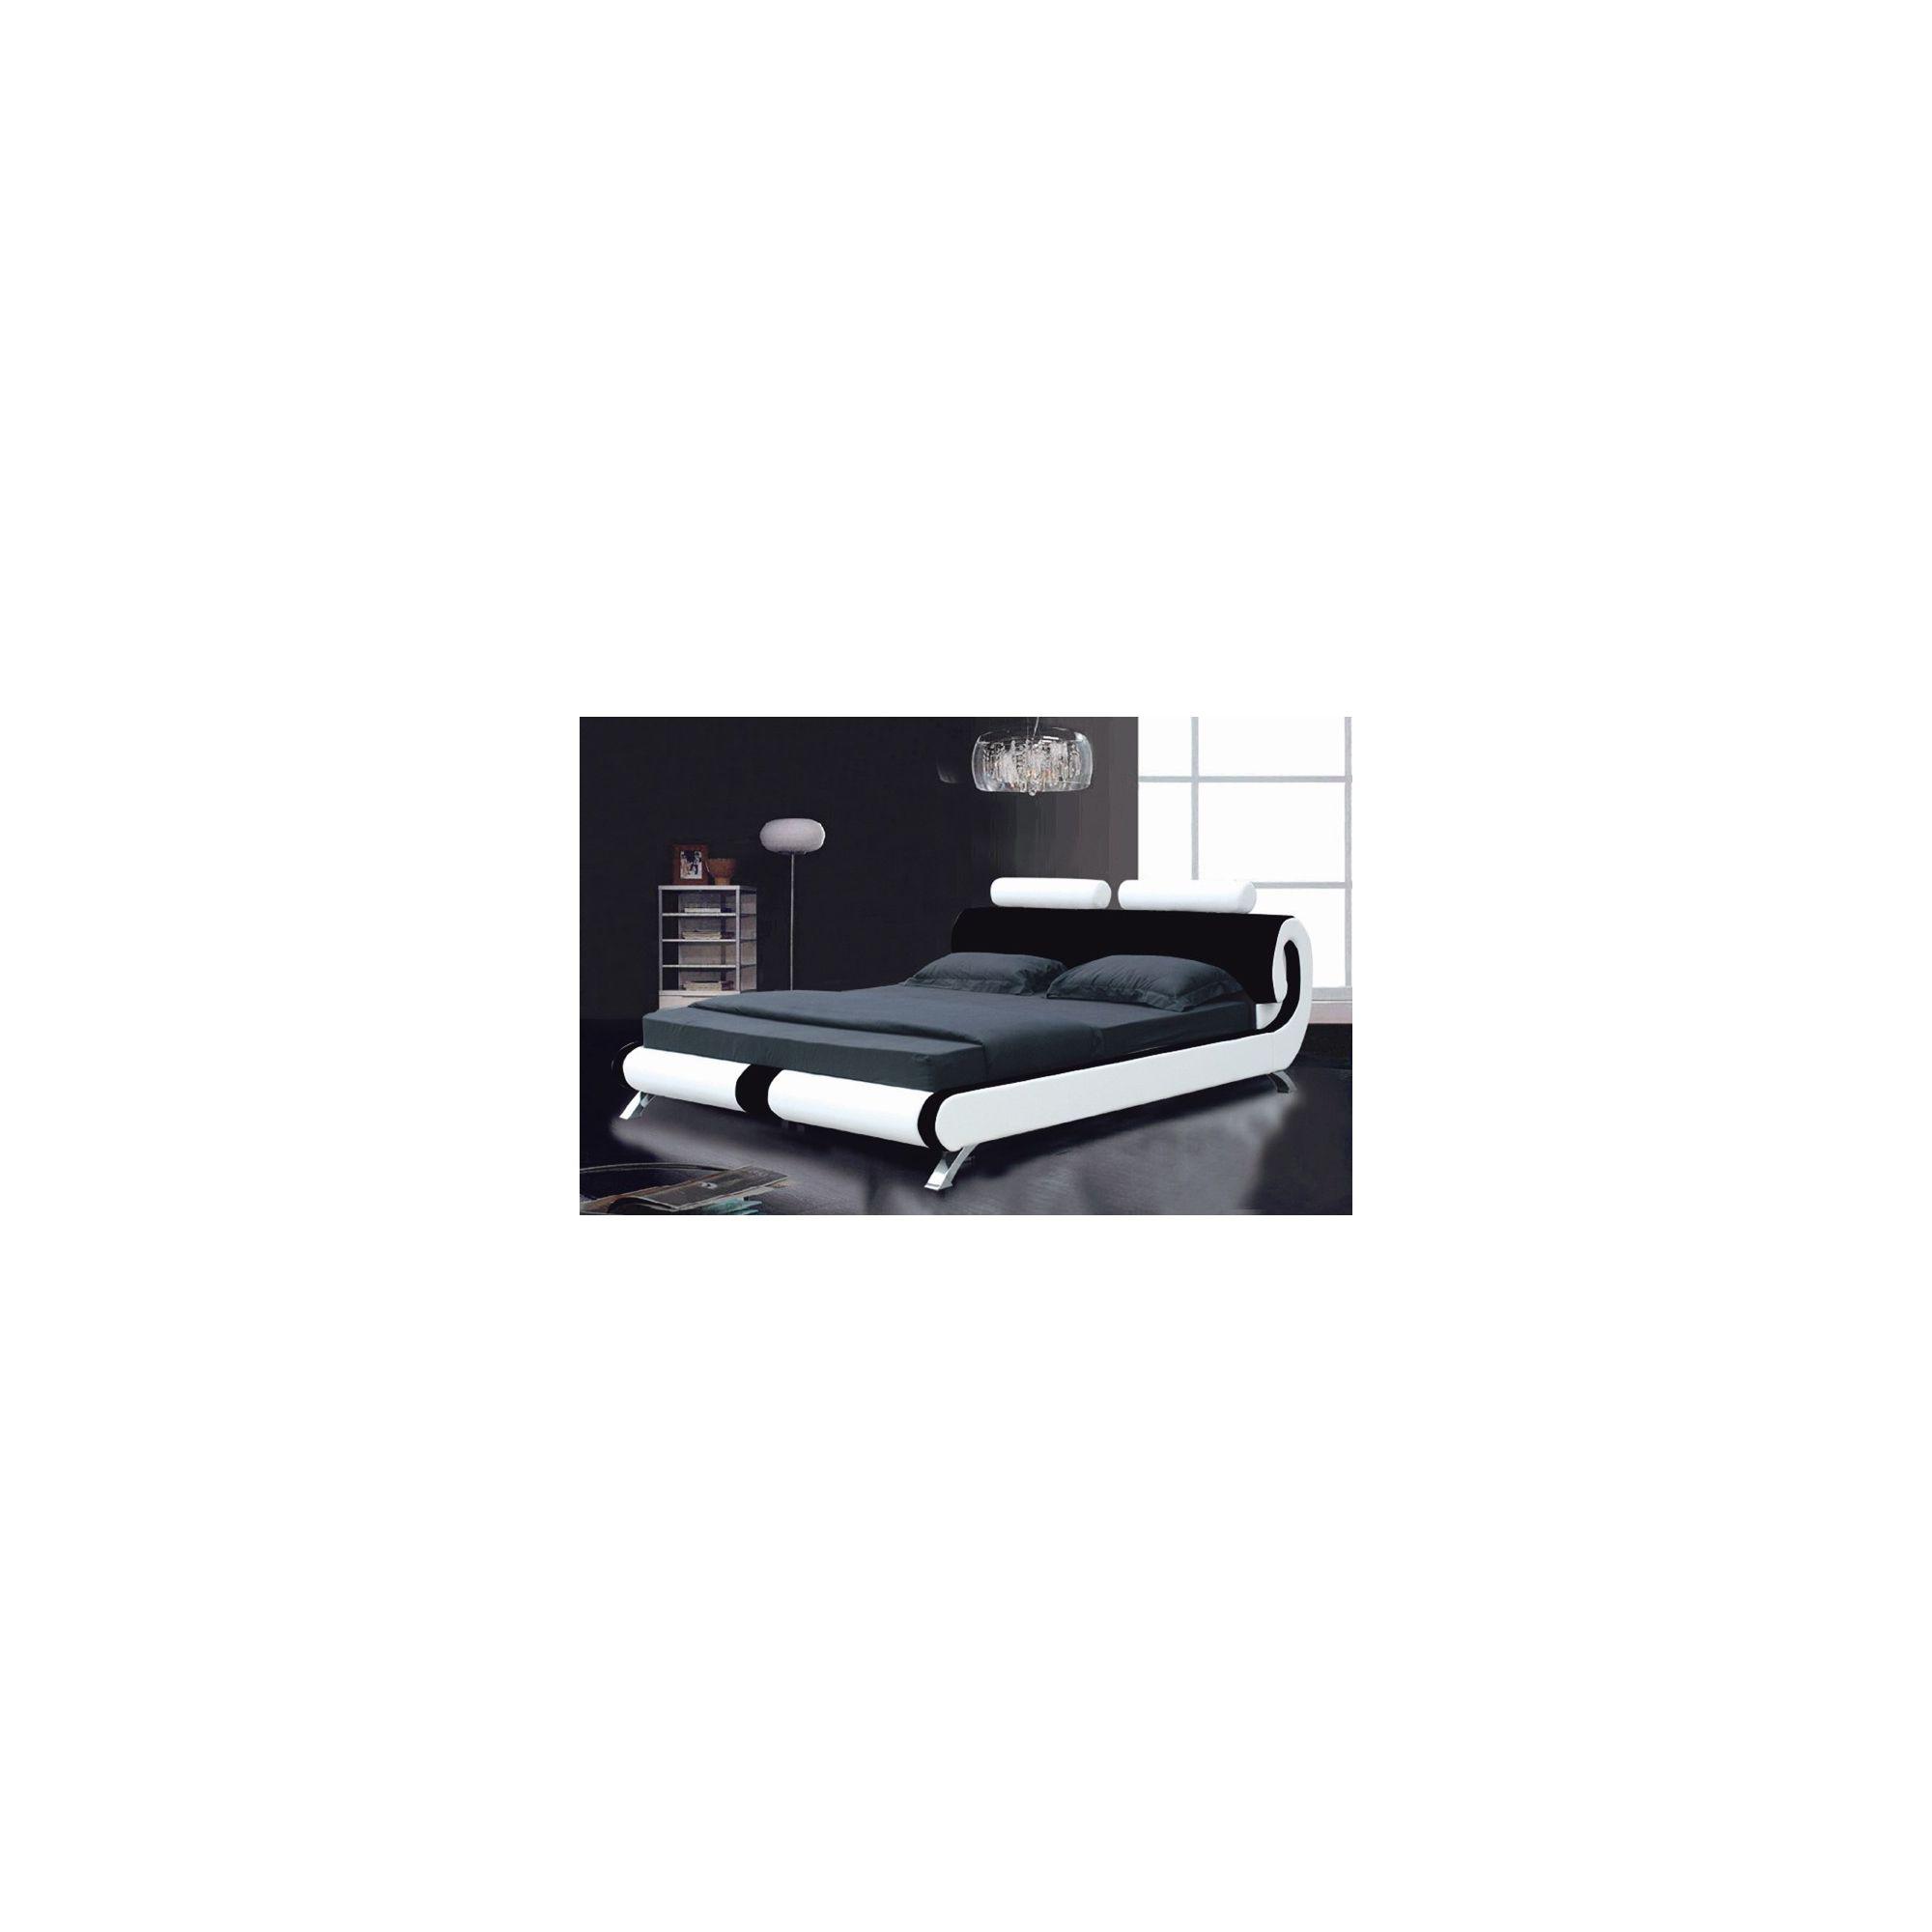 Giomani Designs Designer Curve Bed - White / Black - Double at Tesco Direct